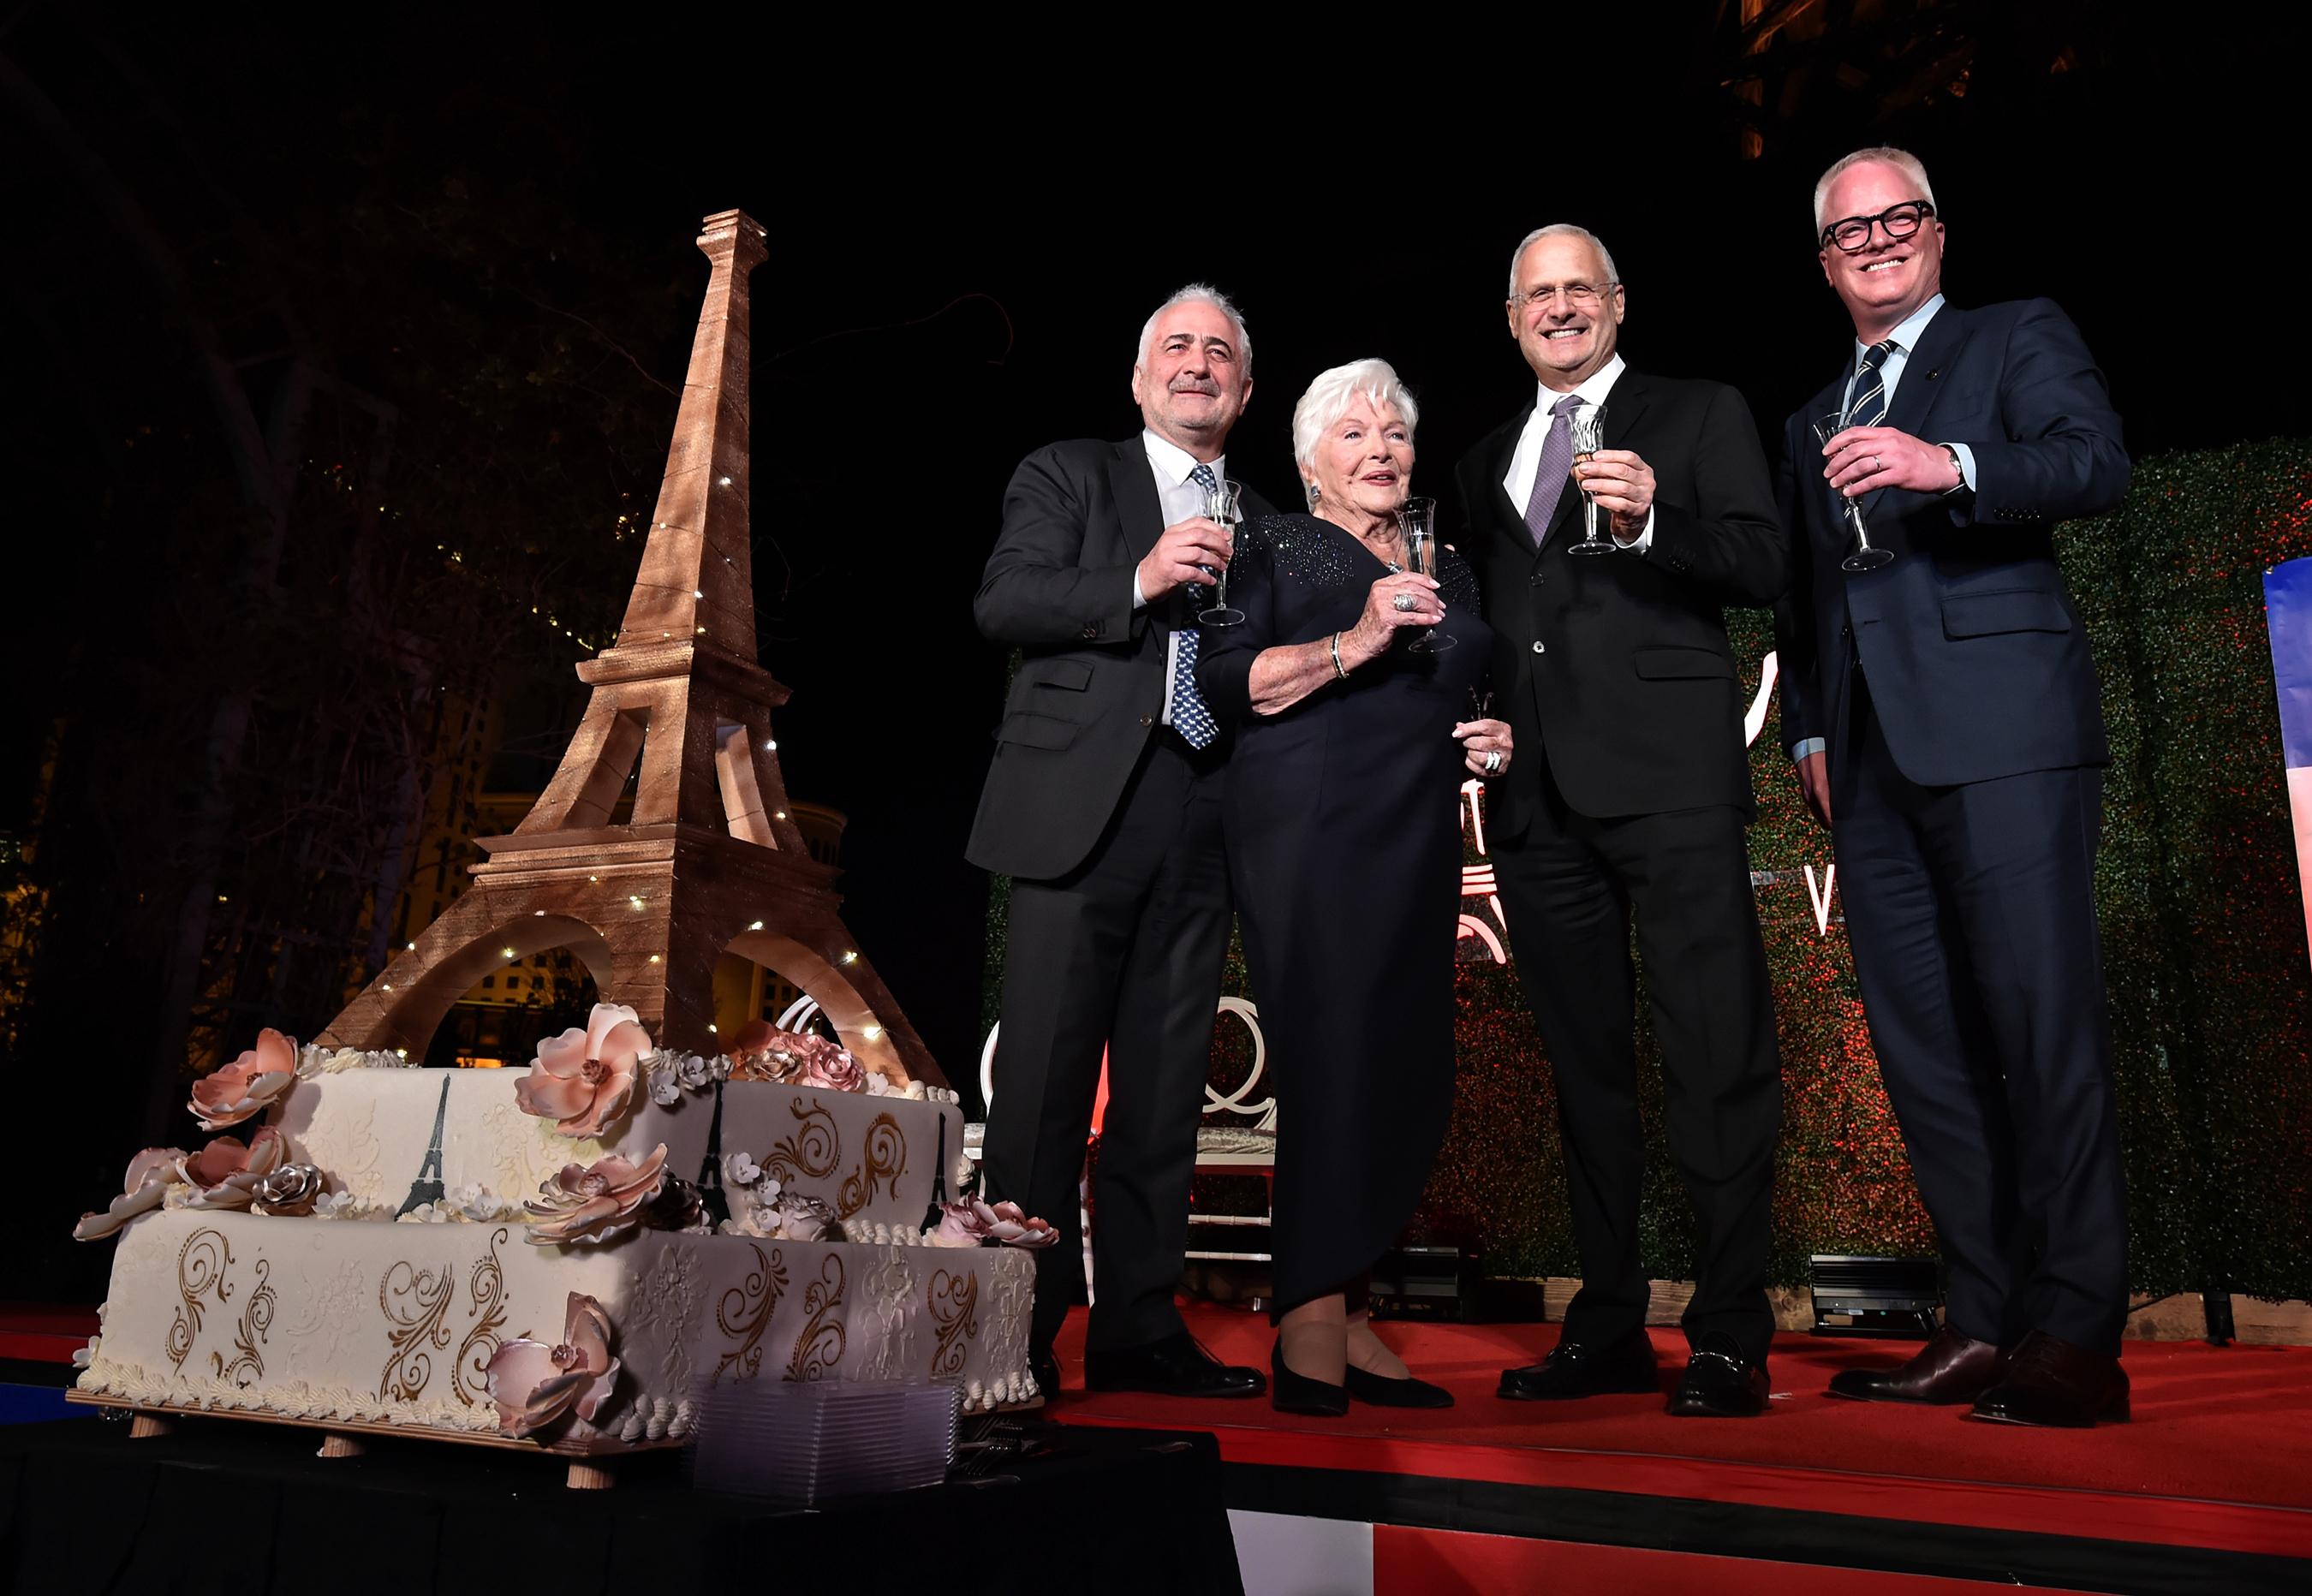 L-R: Chef Guy Savoy, Line Renaud, President of Paris Las Vegas Gary Selesner and EVP & CMO of Caesars Entertainment Chris Holdren toast to the new Eiffel Tower lights. (Courtesy of Paris Las Vegas)